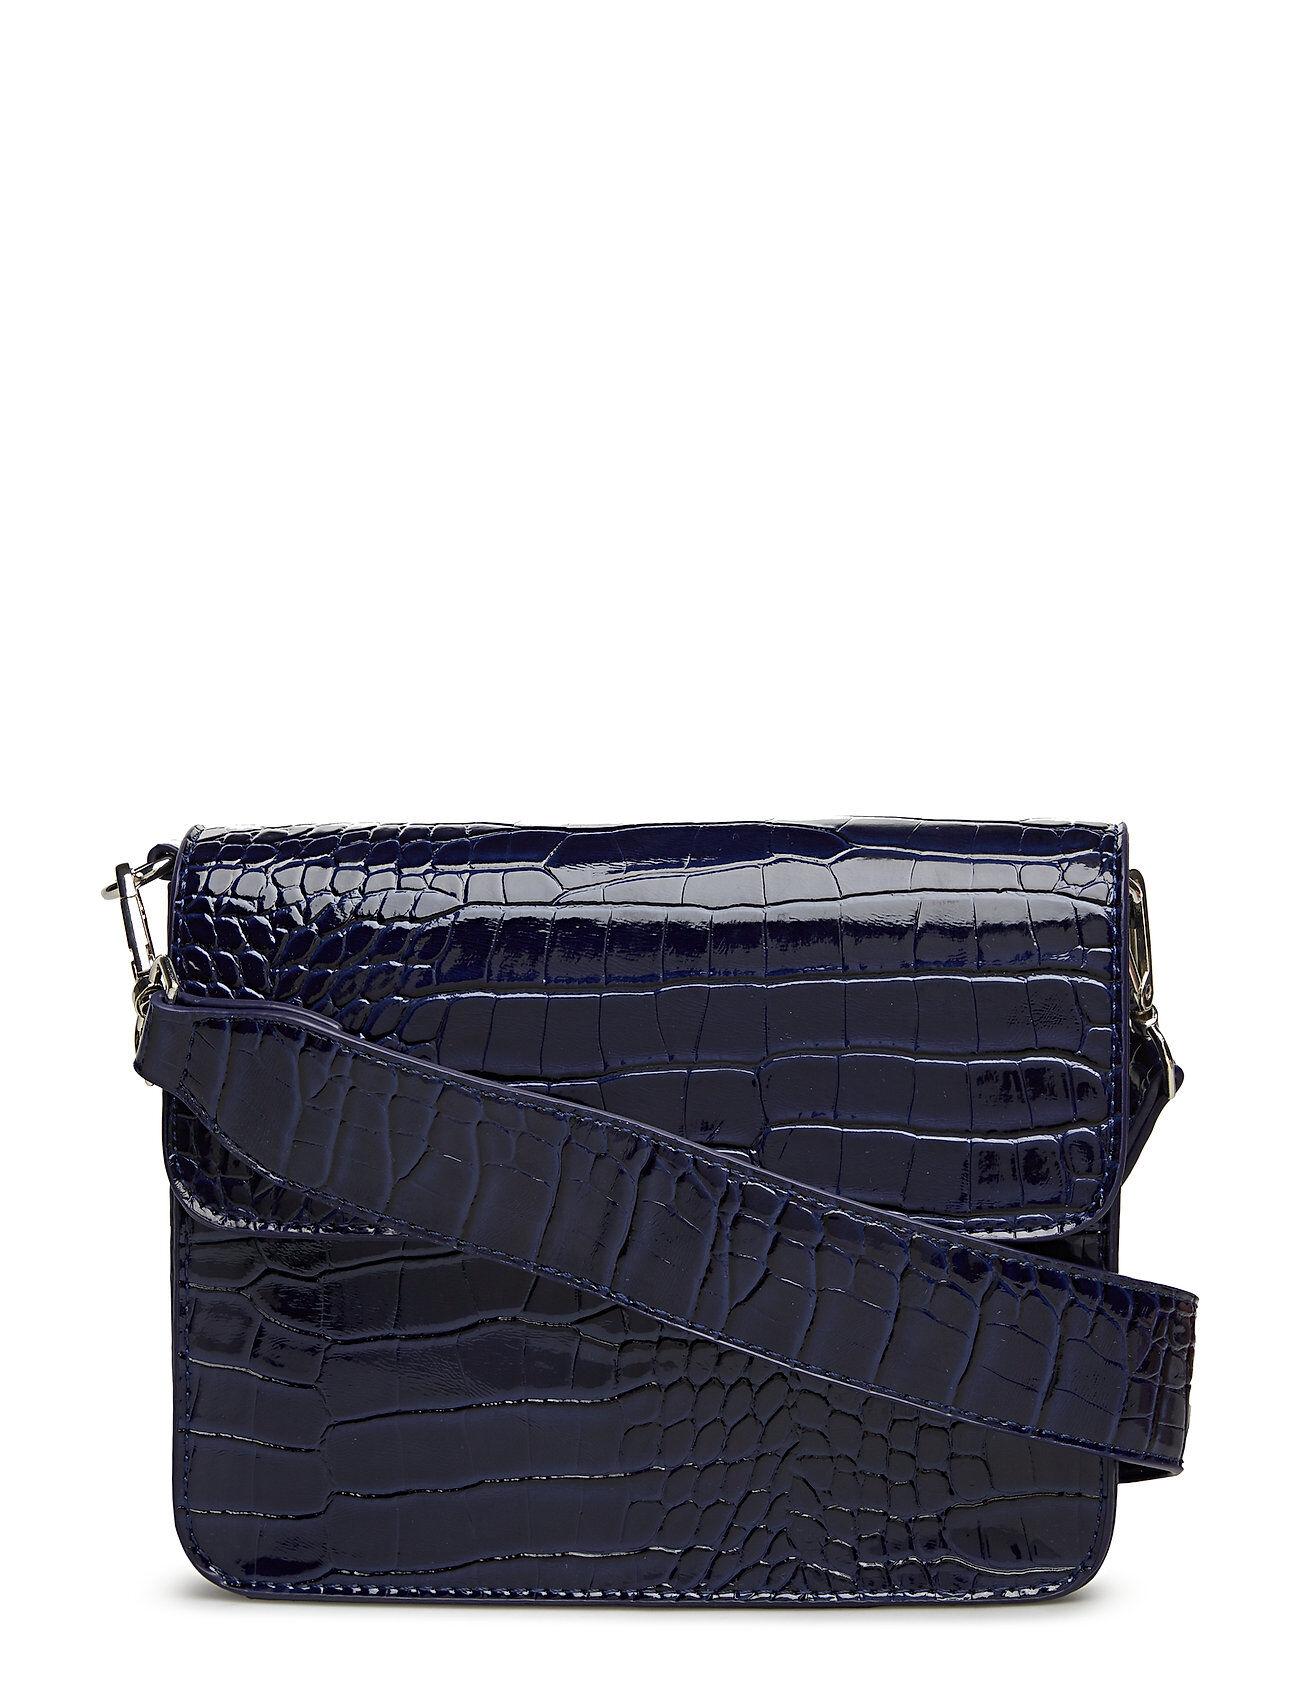 Hvisk Cayman Shiny Strap Bag